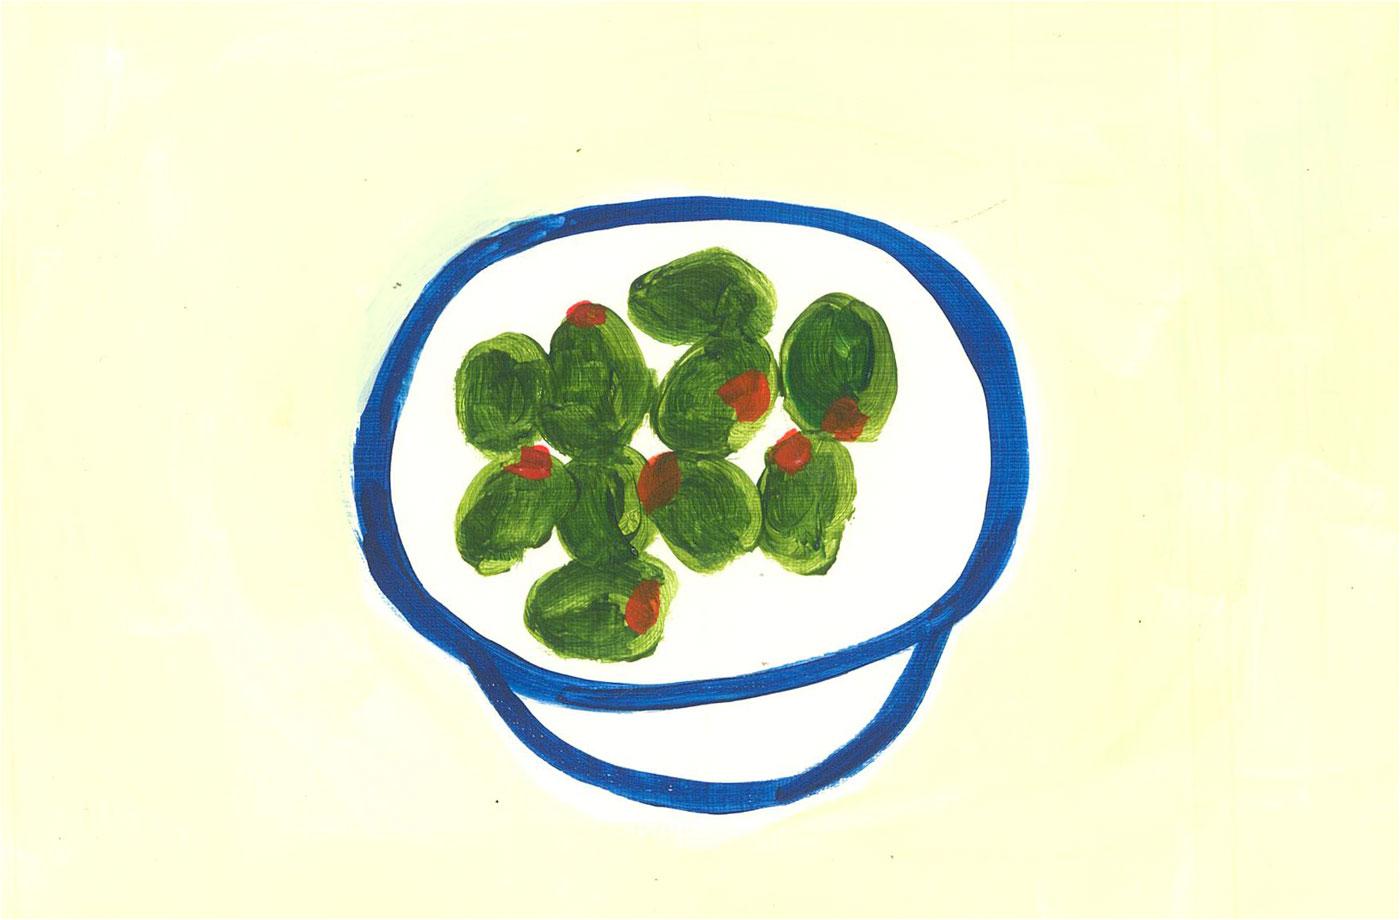 Sian Roberts - 2021 Acrylic, Olives